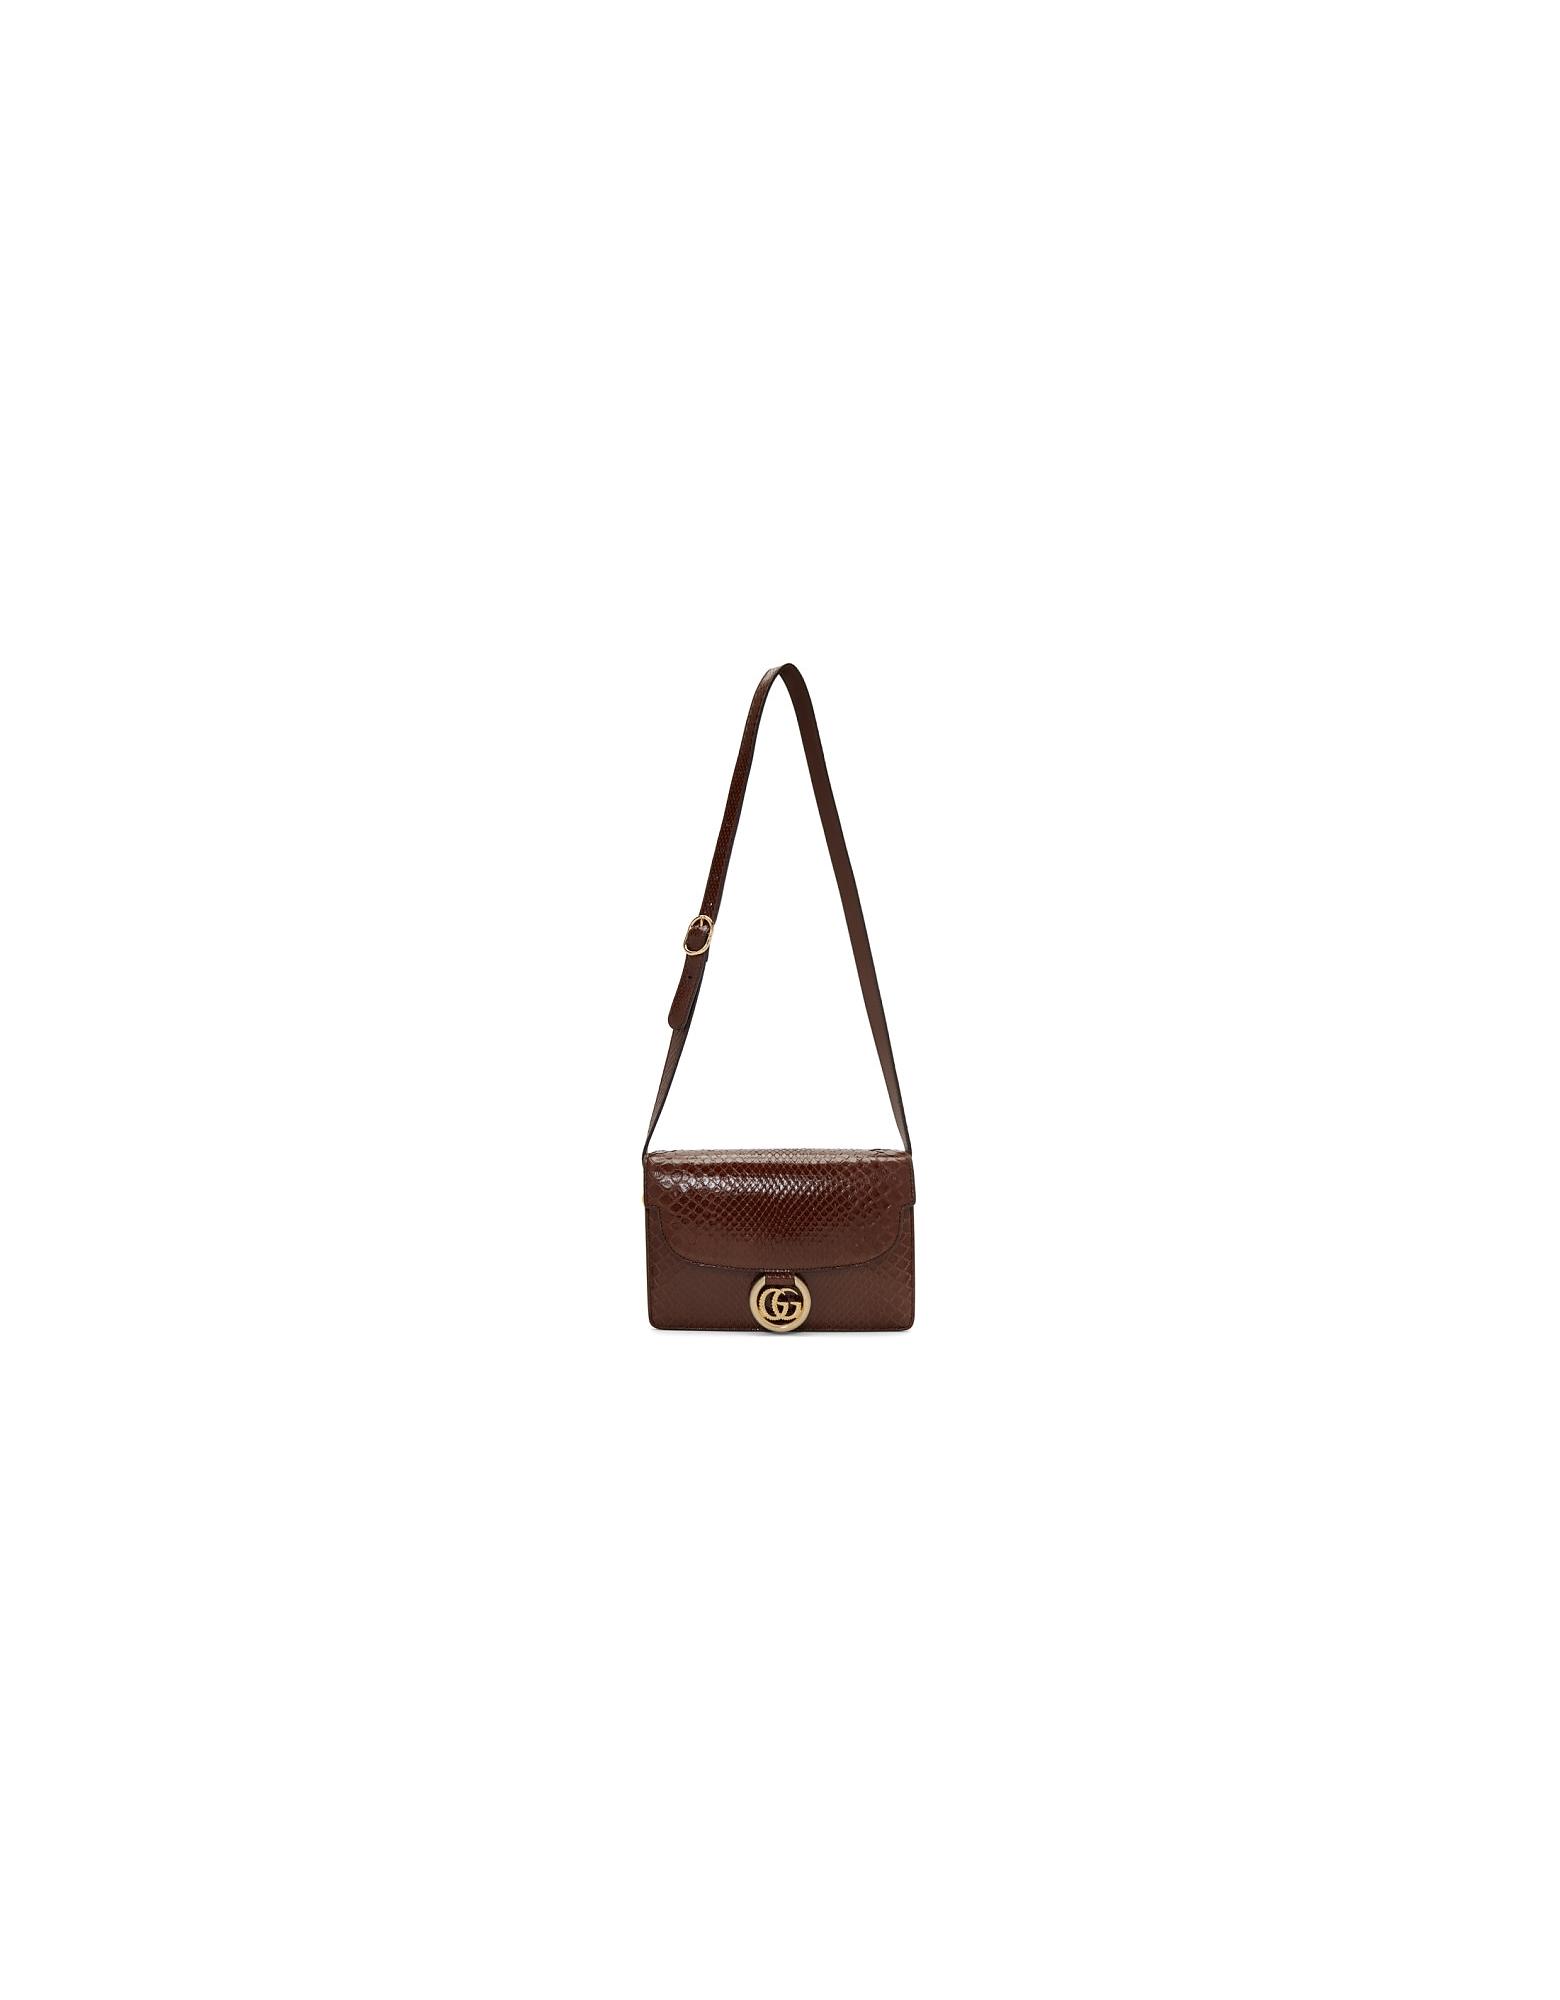 Gucci Designer Handbags, Brown Small Snake GG Ring Bag